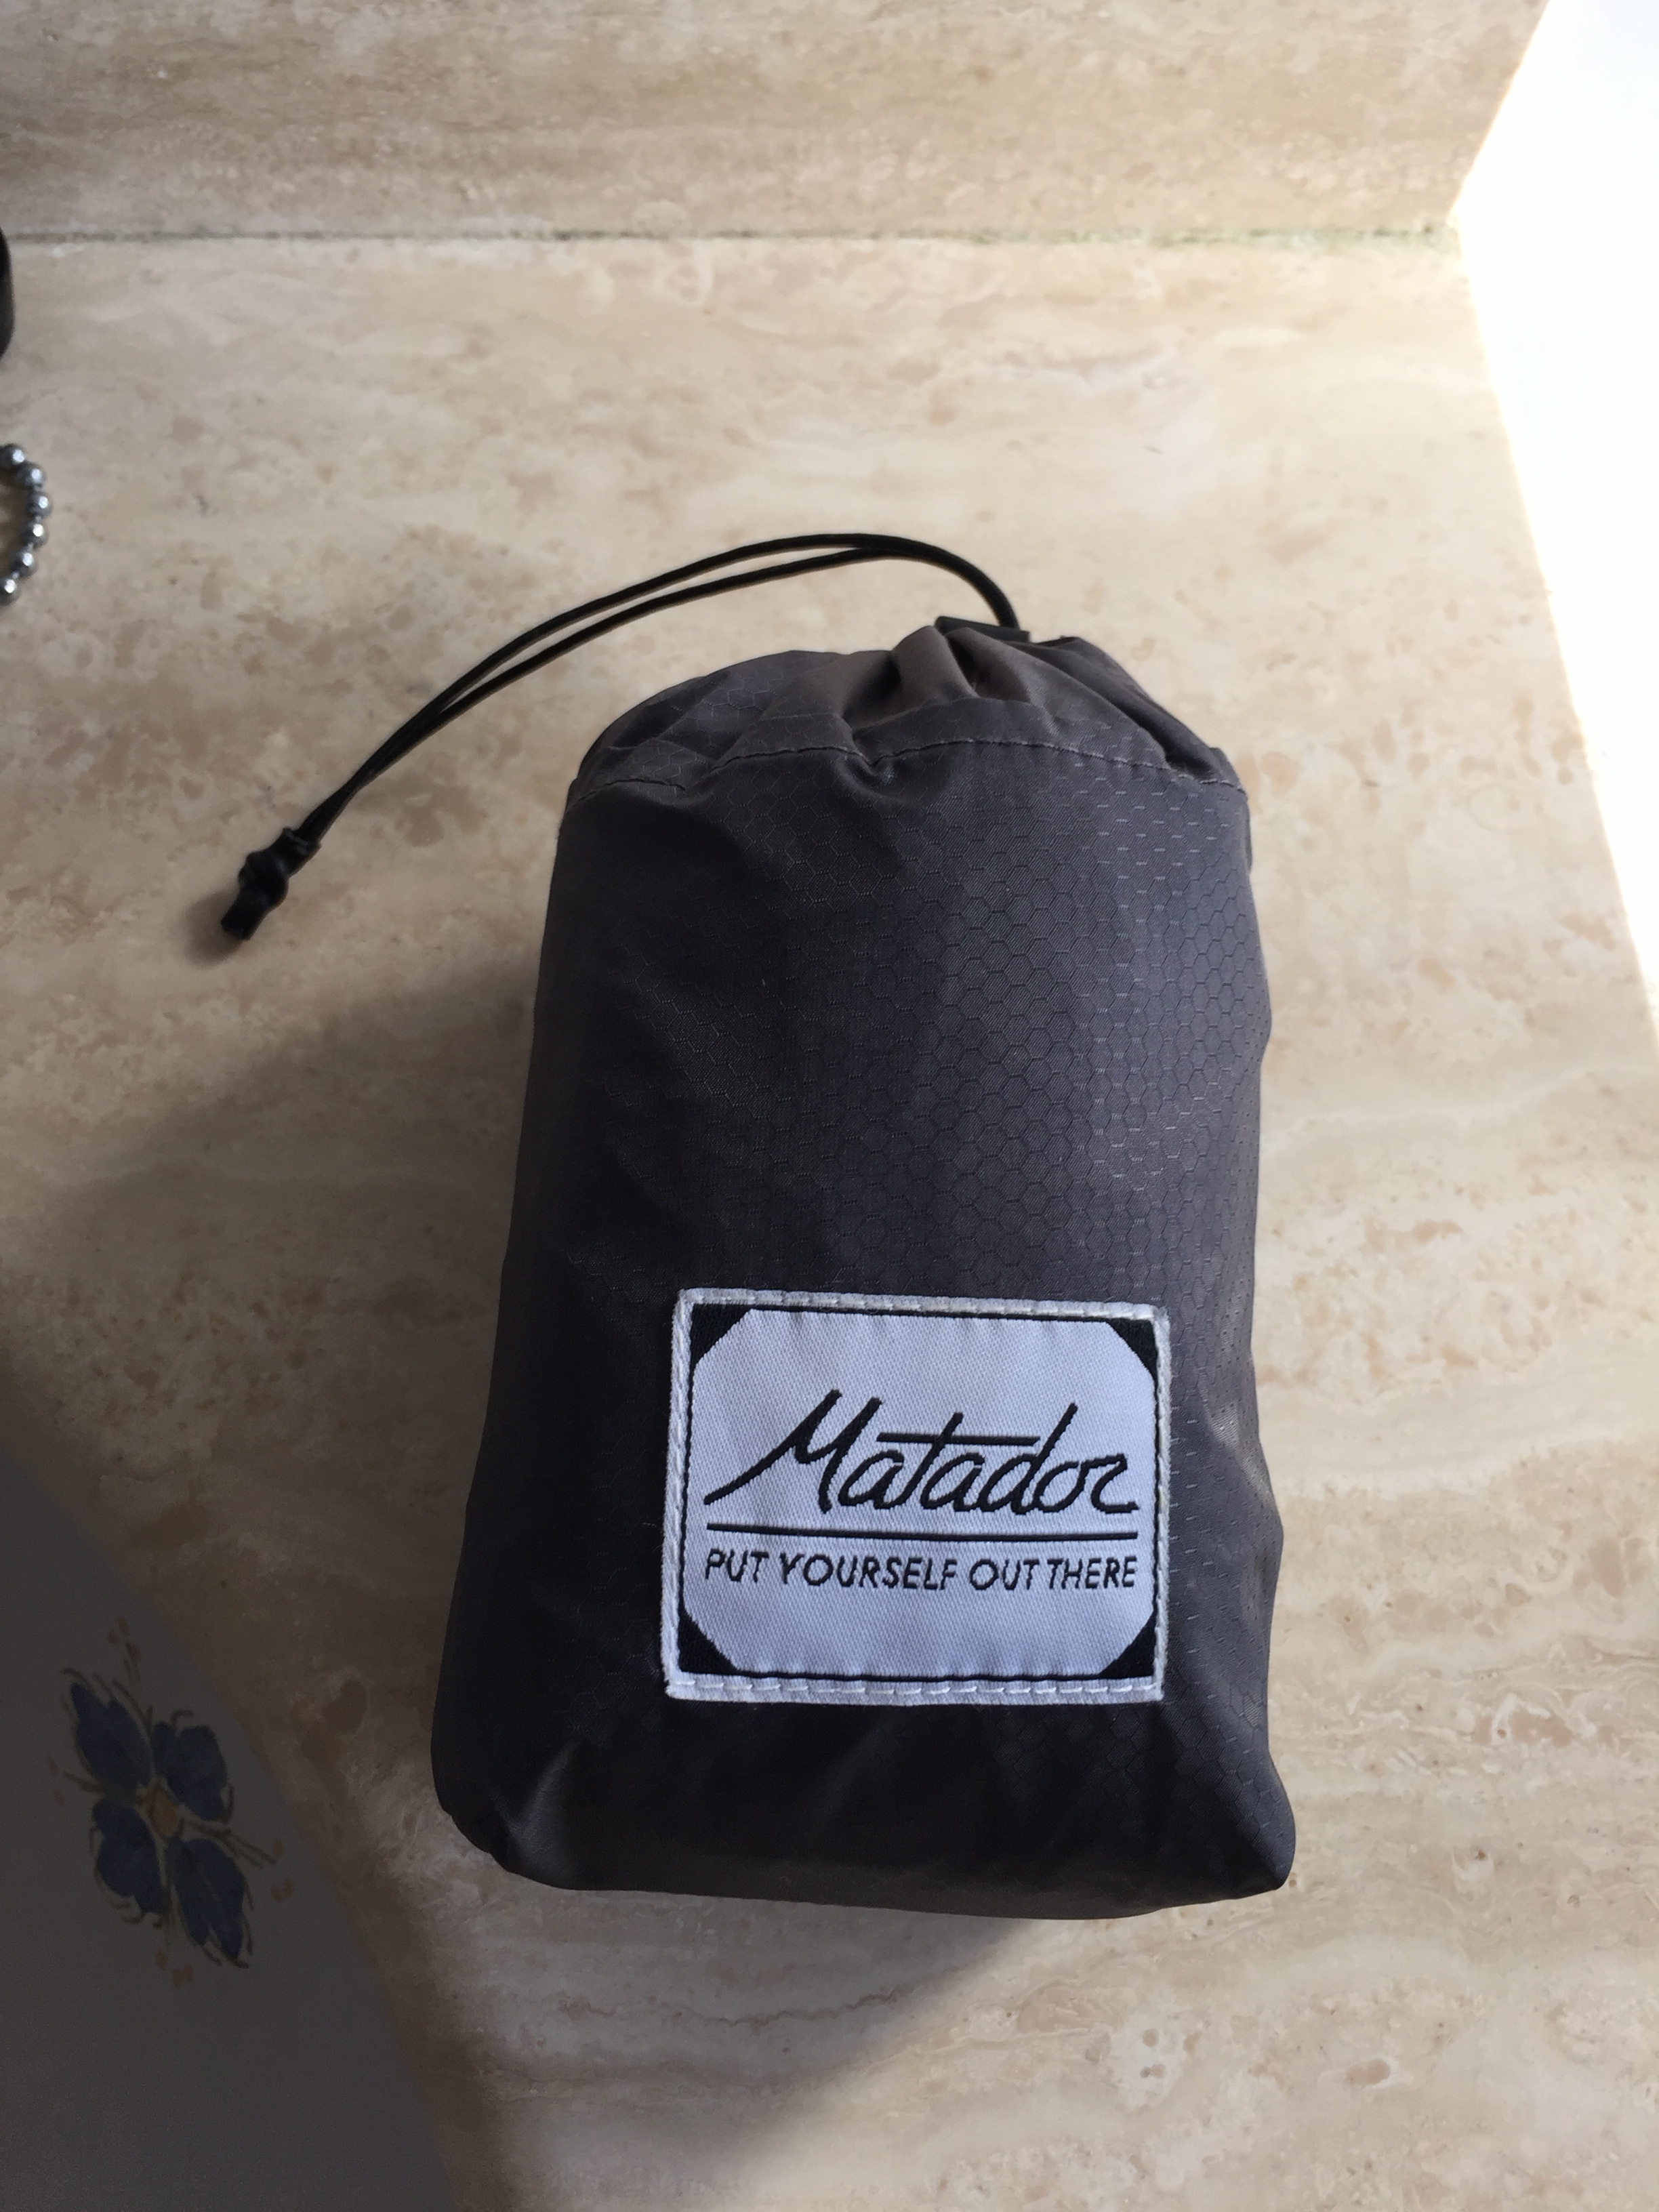 Matador FreeRain24 Waterproof Packable Backpack  Combining innovation and  practicality – Leeds Foodie 74827c1d3d377